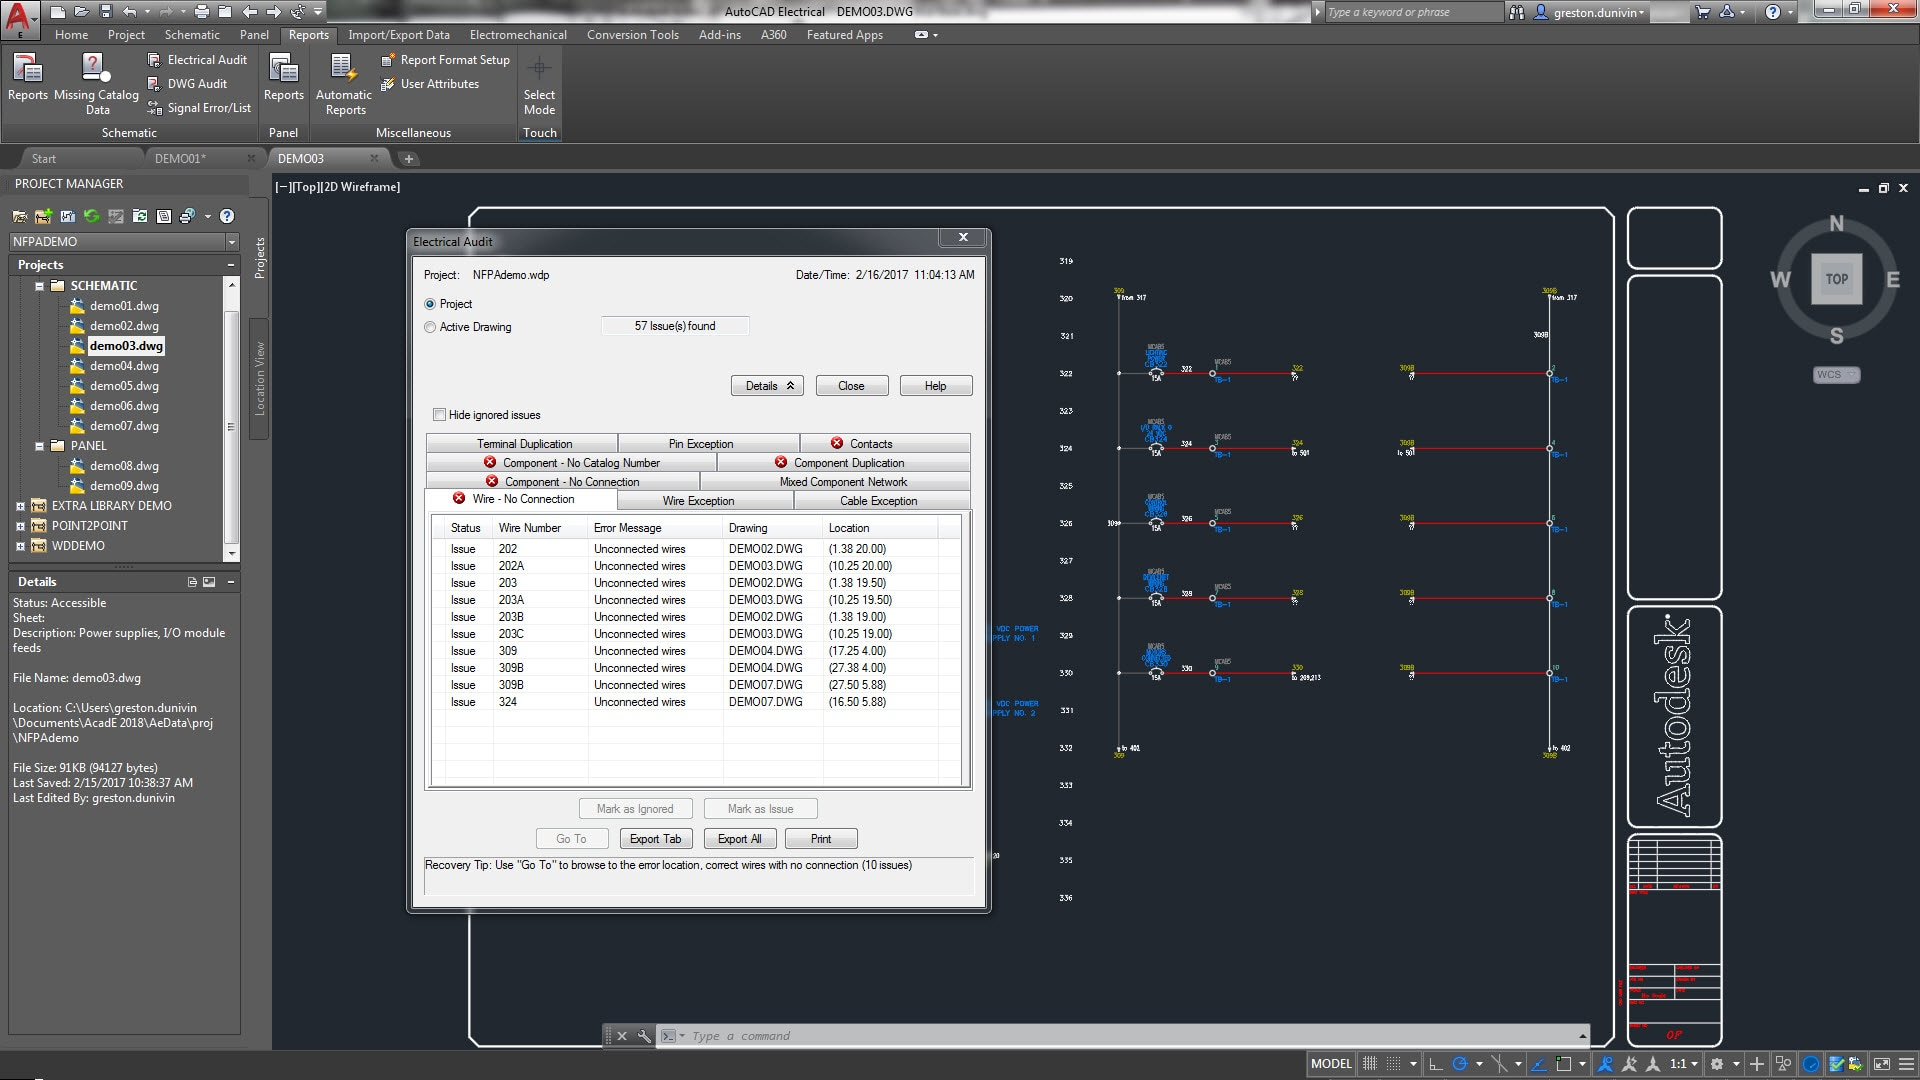 Variable Crossover Schematics Free Download Wiring Diagram Schematic